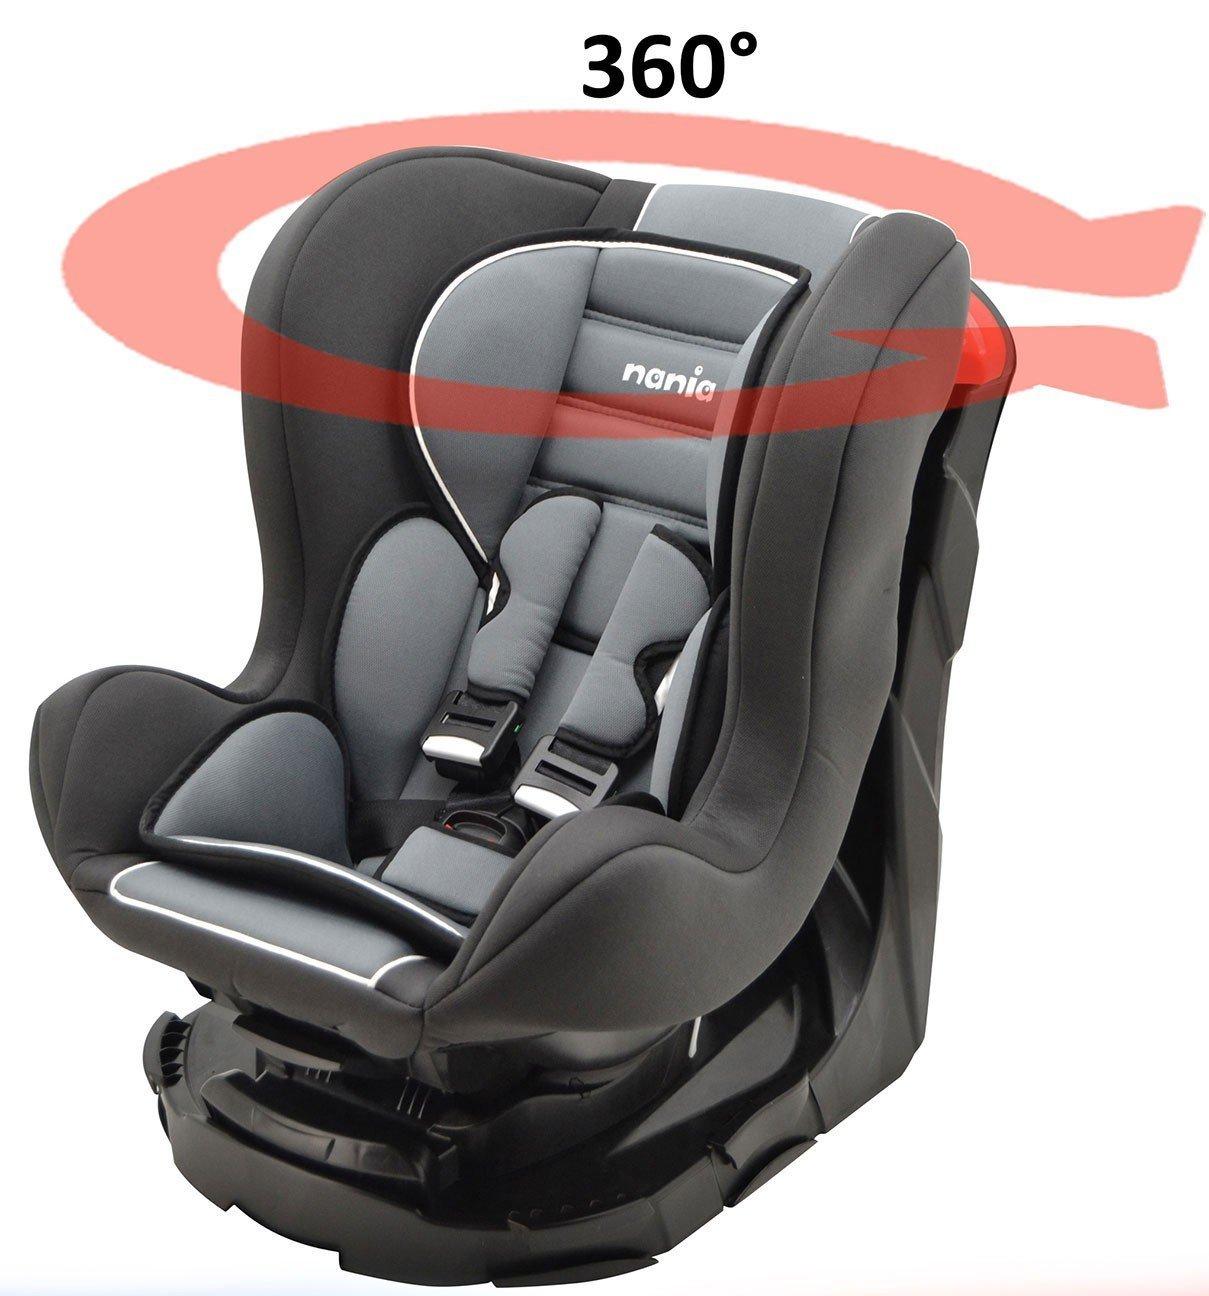 Siège Auto Mycarsit 360°